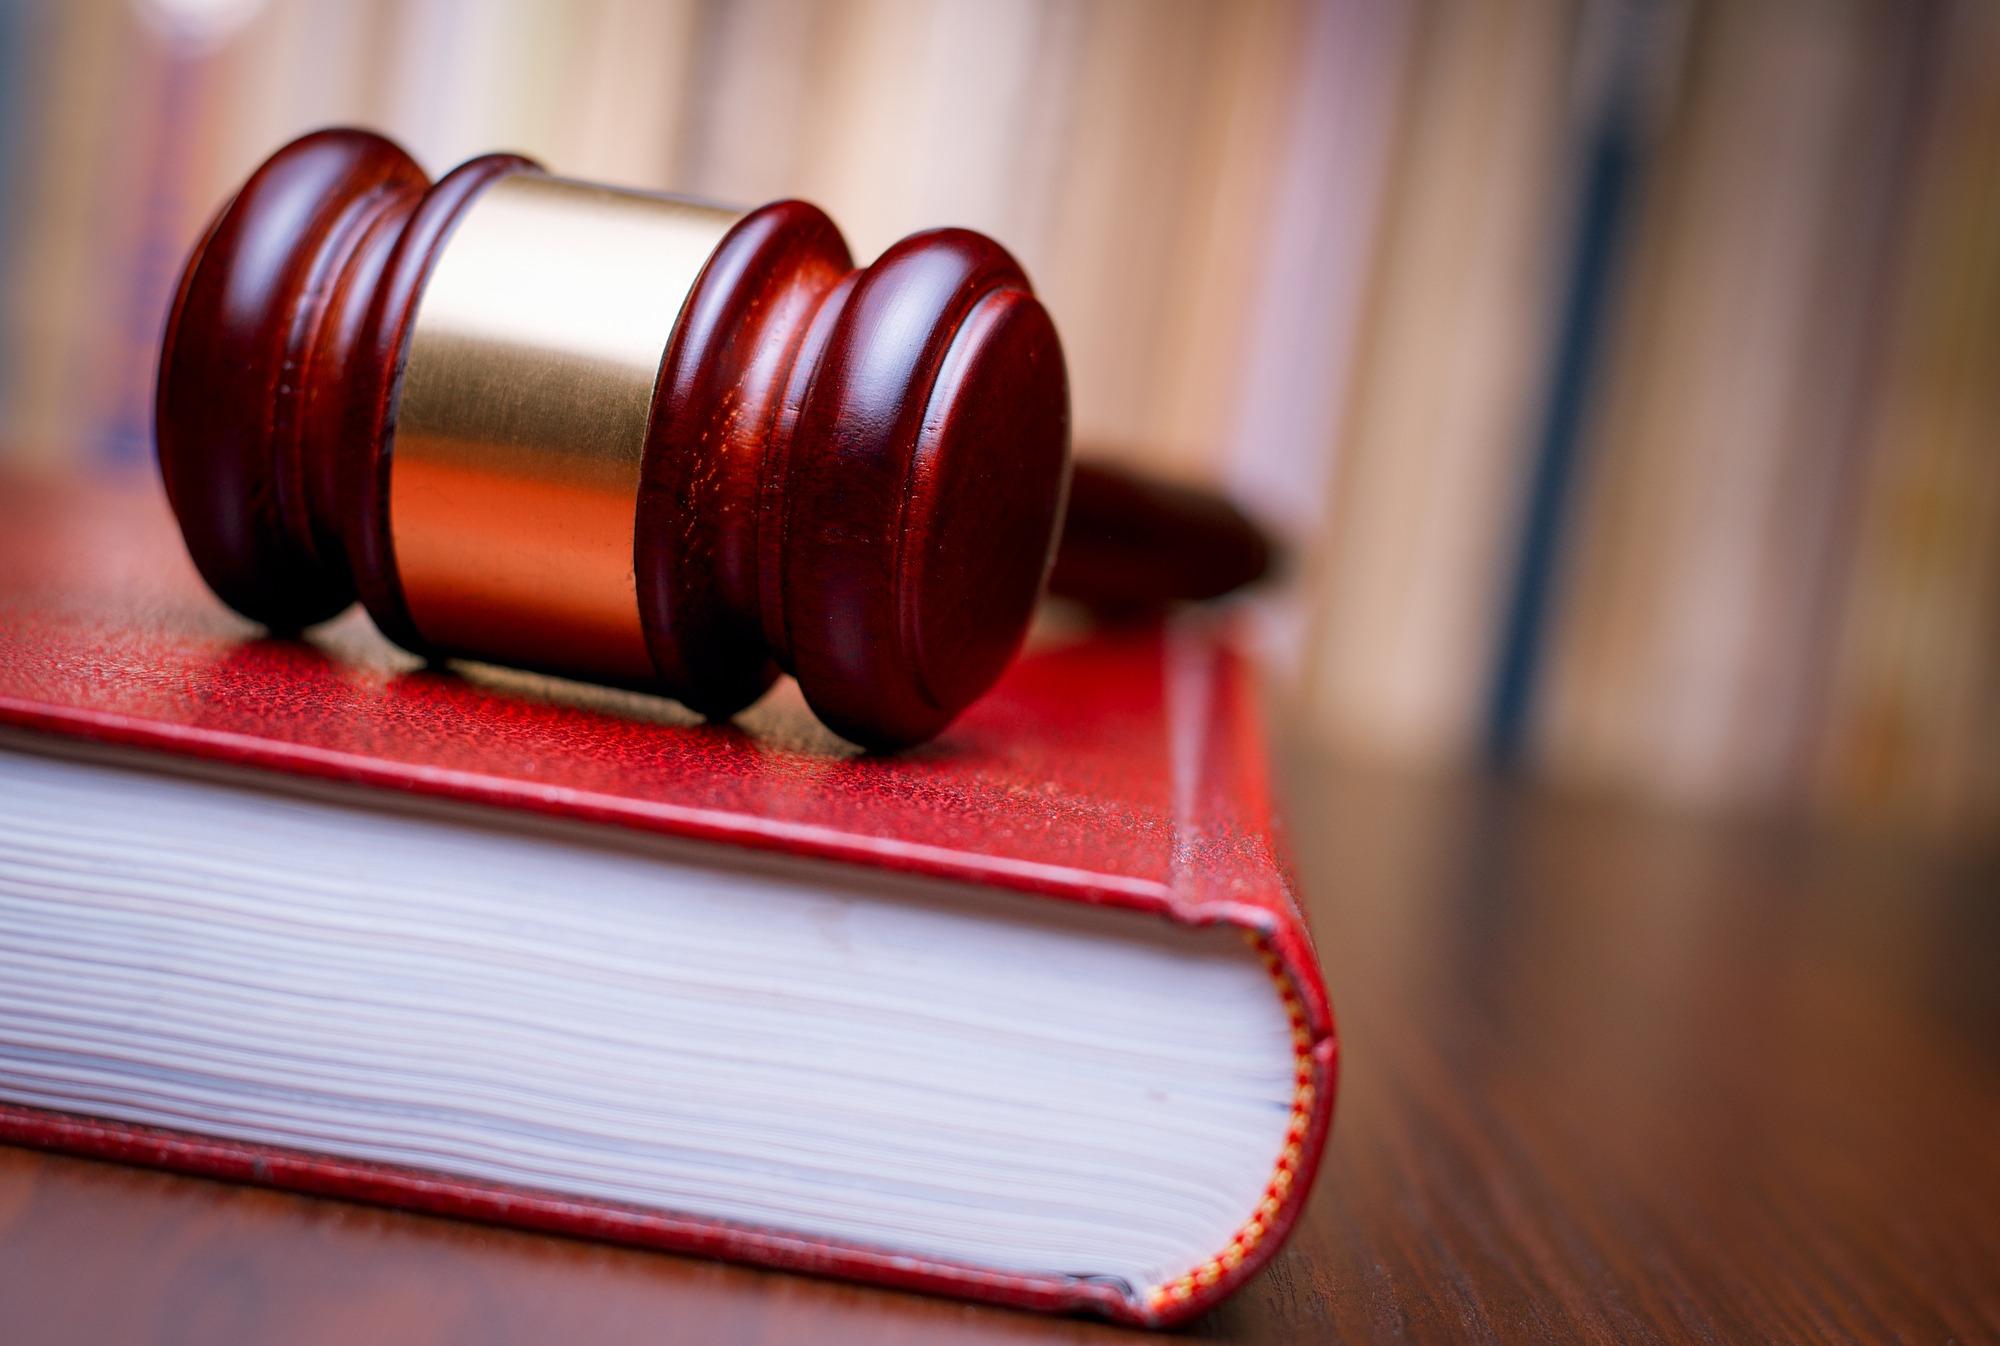 sozialrecht, hannover rechtsberatung, laatzen anwaltskanzlei steinke